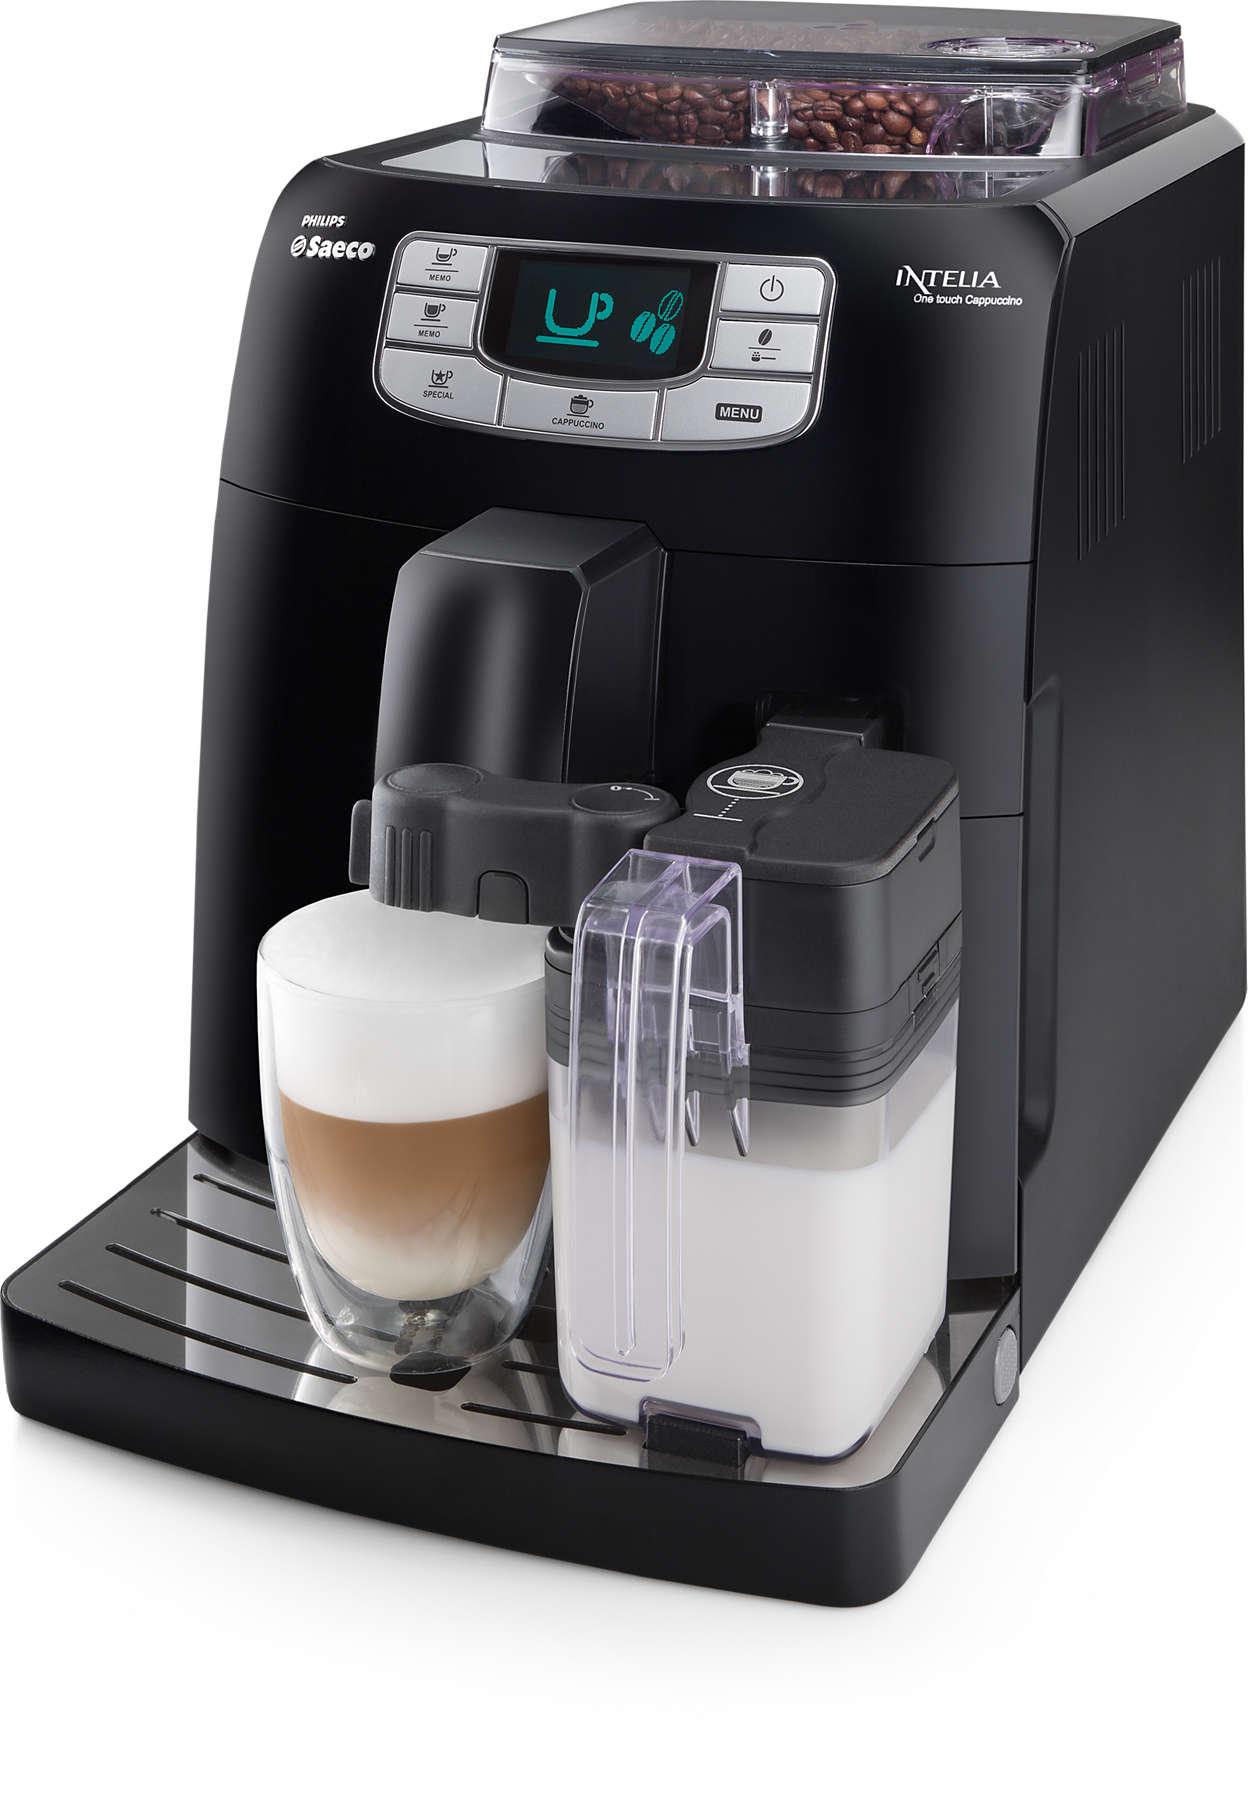 One touch Espresso and Cappuccino